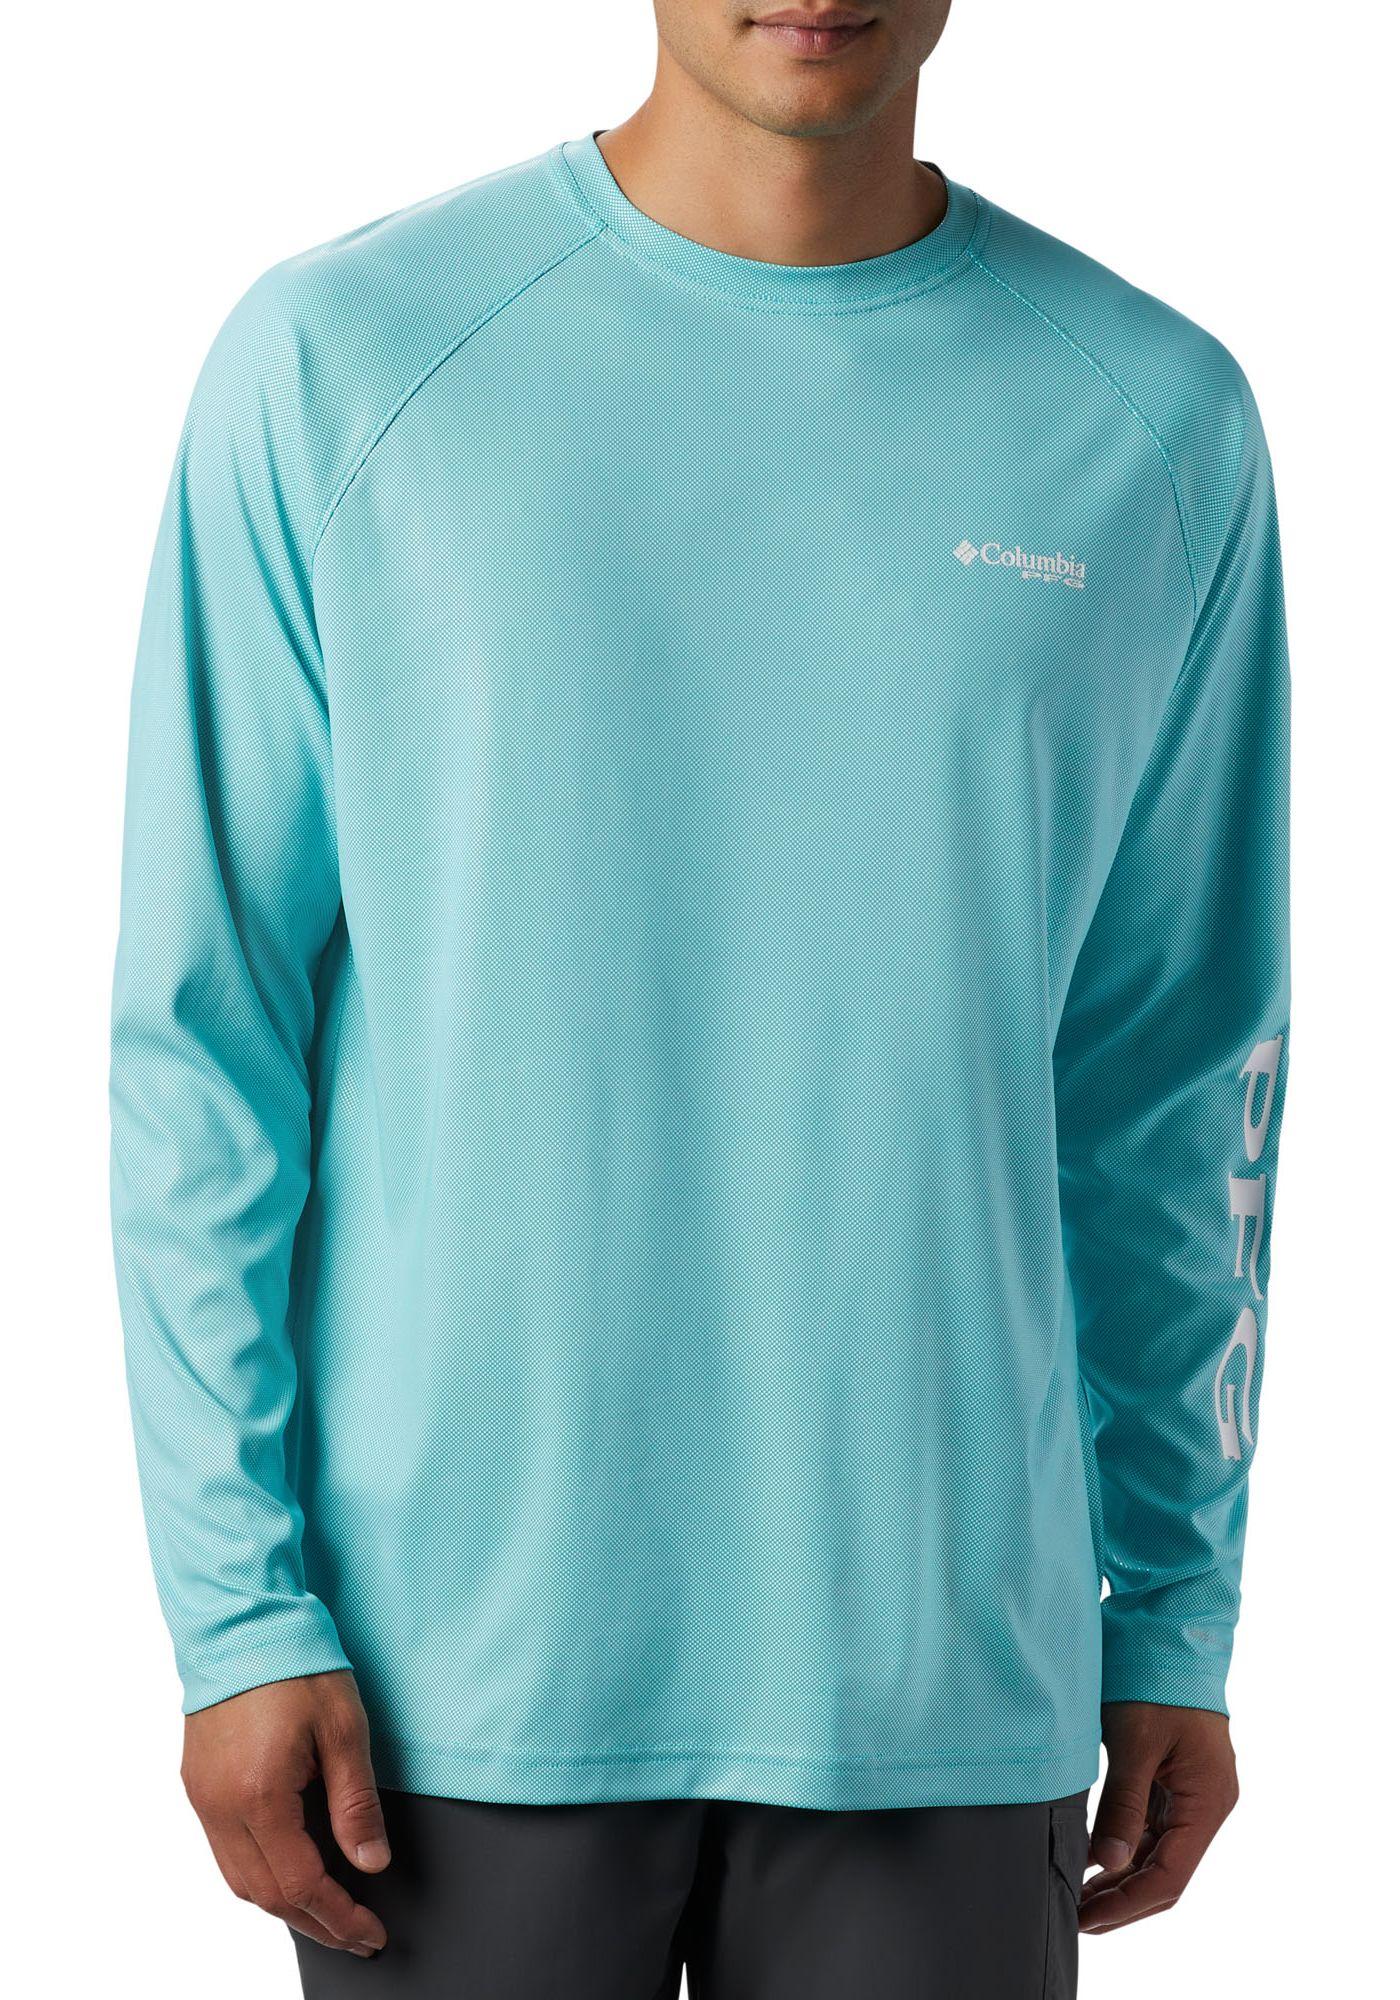 Columbia Men's Terminal Deflector Long Sleeve Shirt